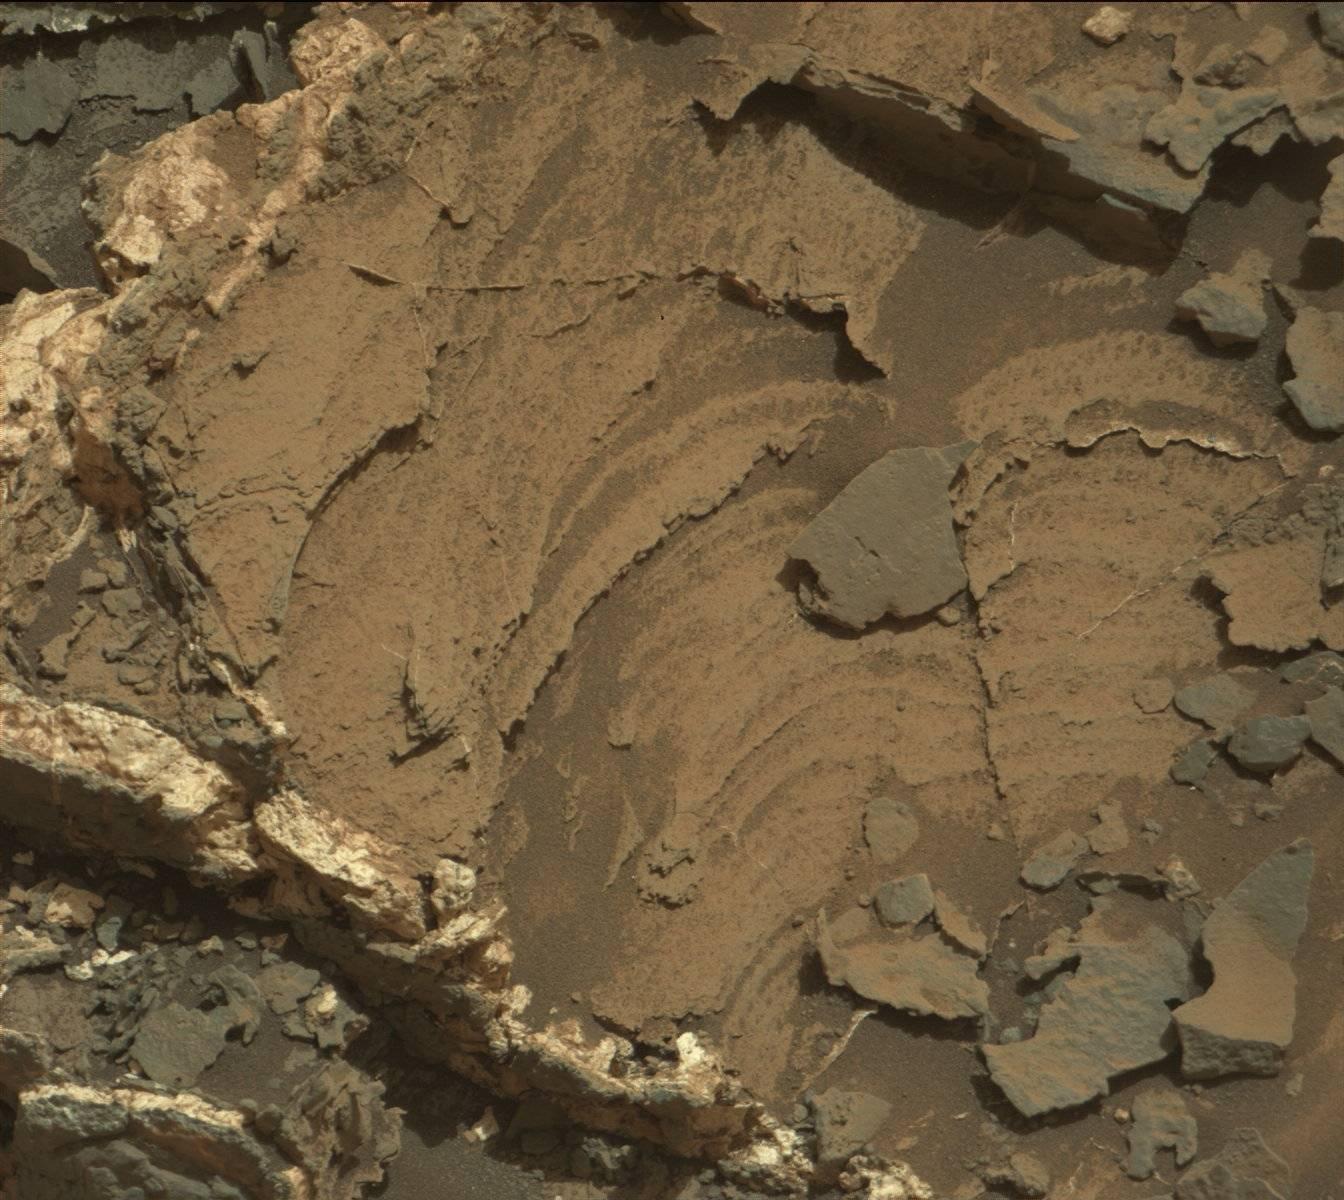 Sol 946 Mastcam image of Kern Peak